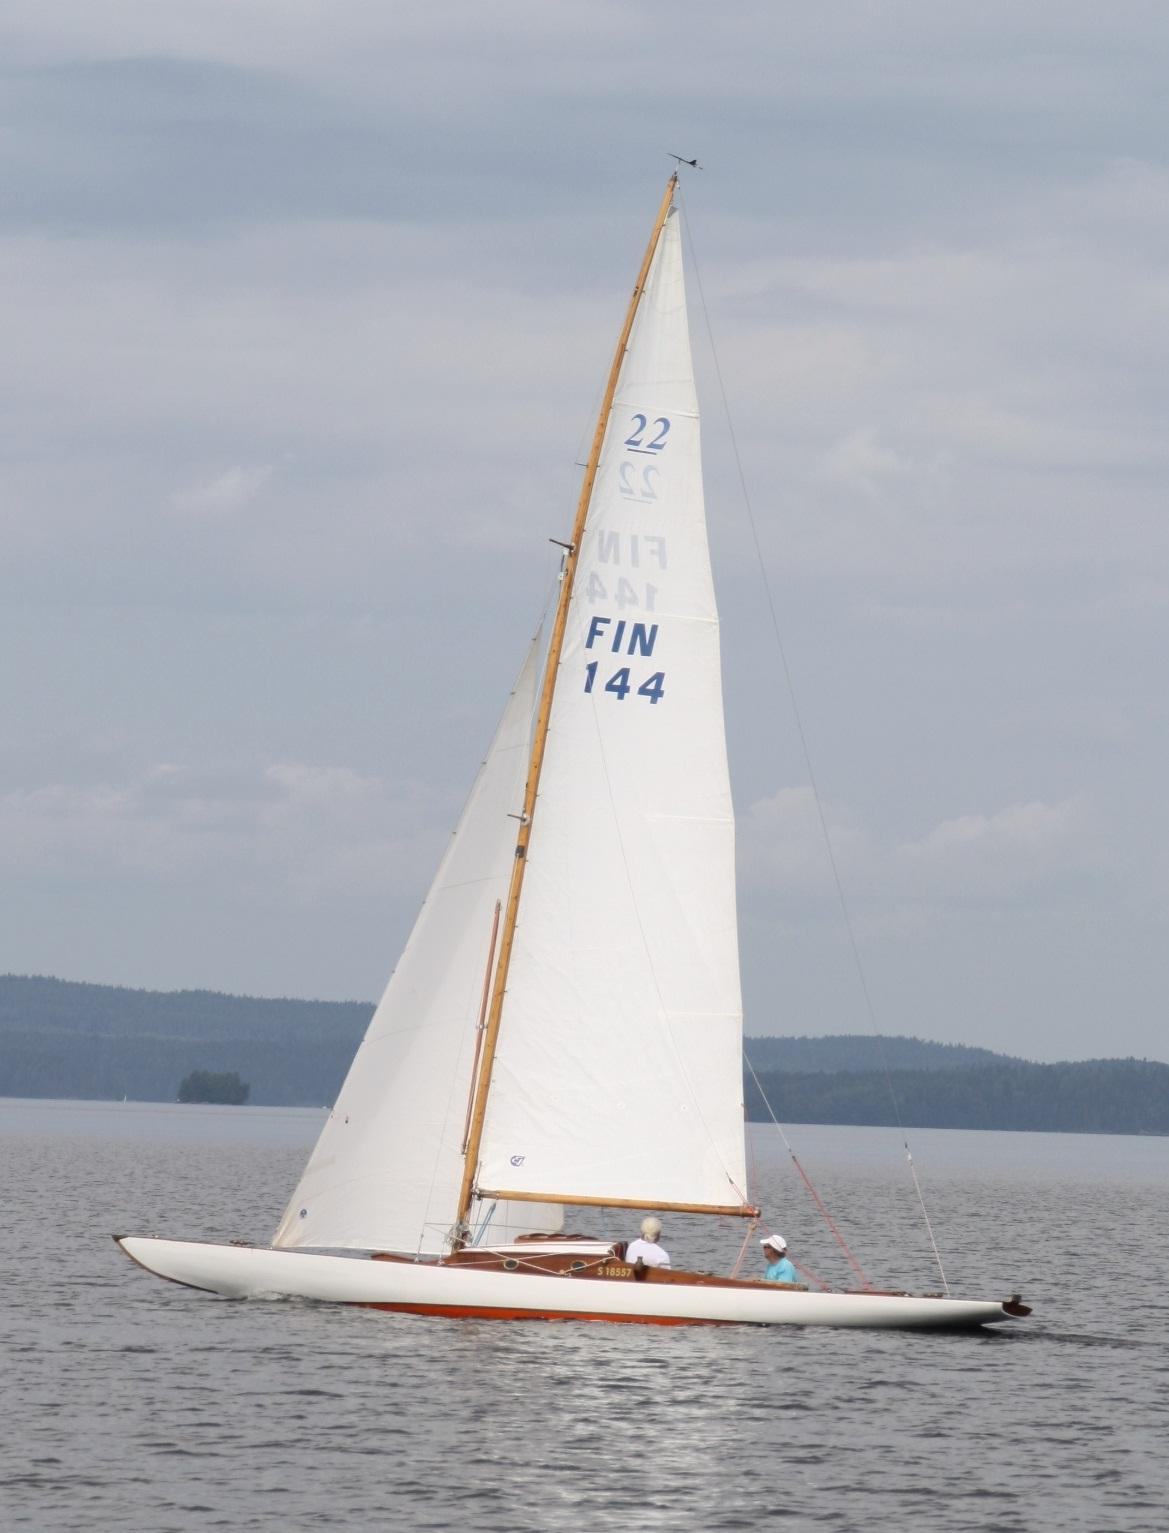 SK22 Rox-Mary FIN-144